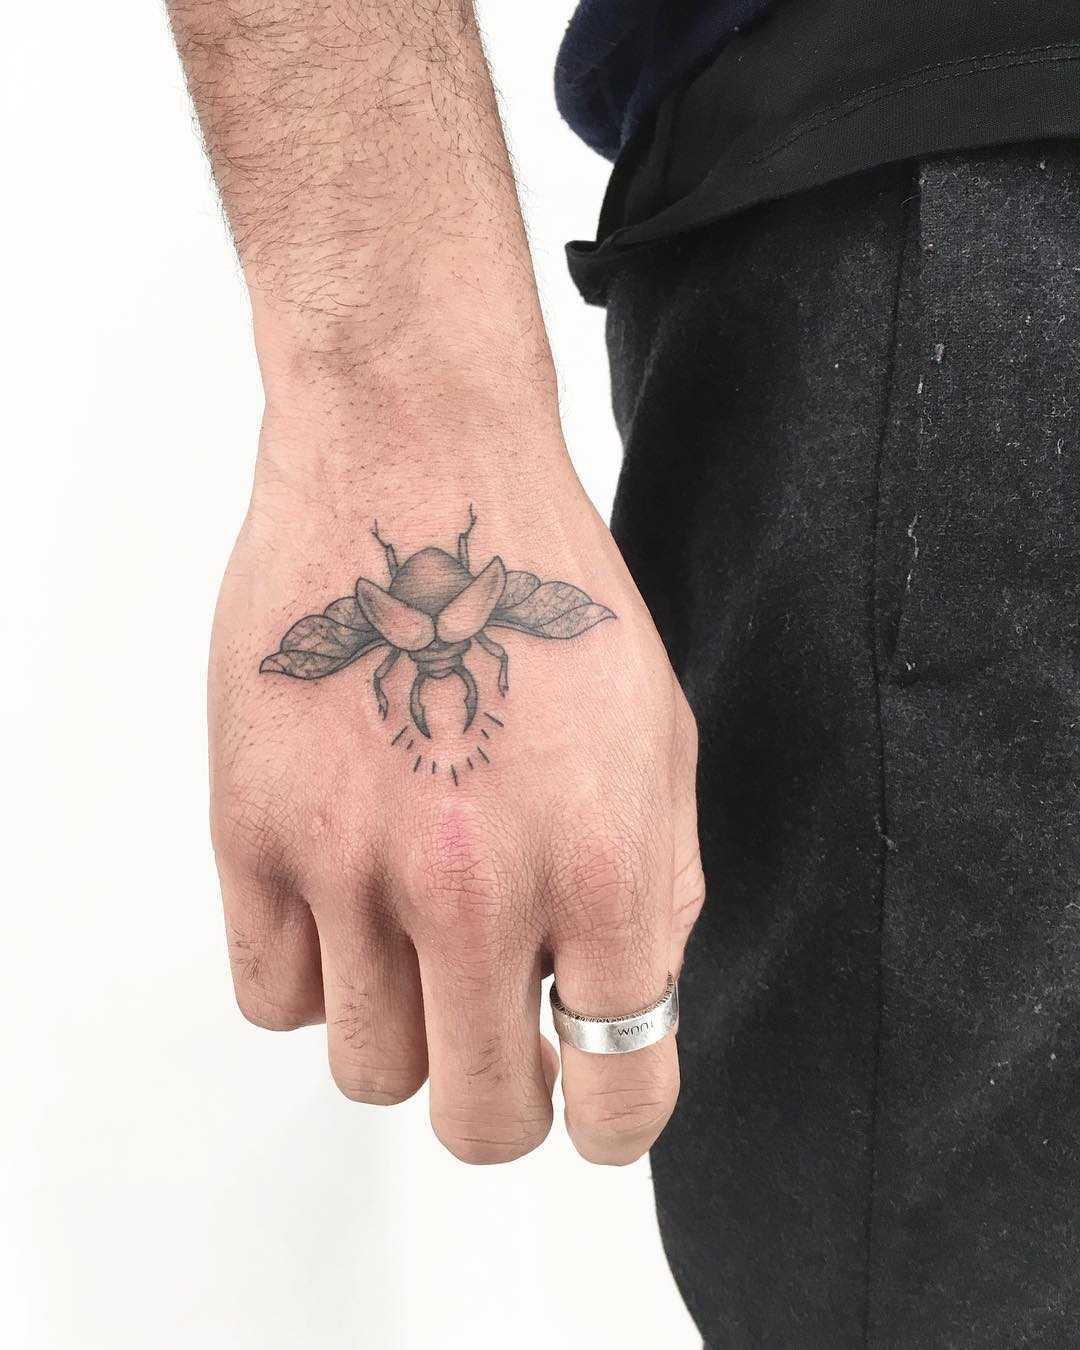 Little beetle tattoo by Gianina Caputo